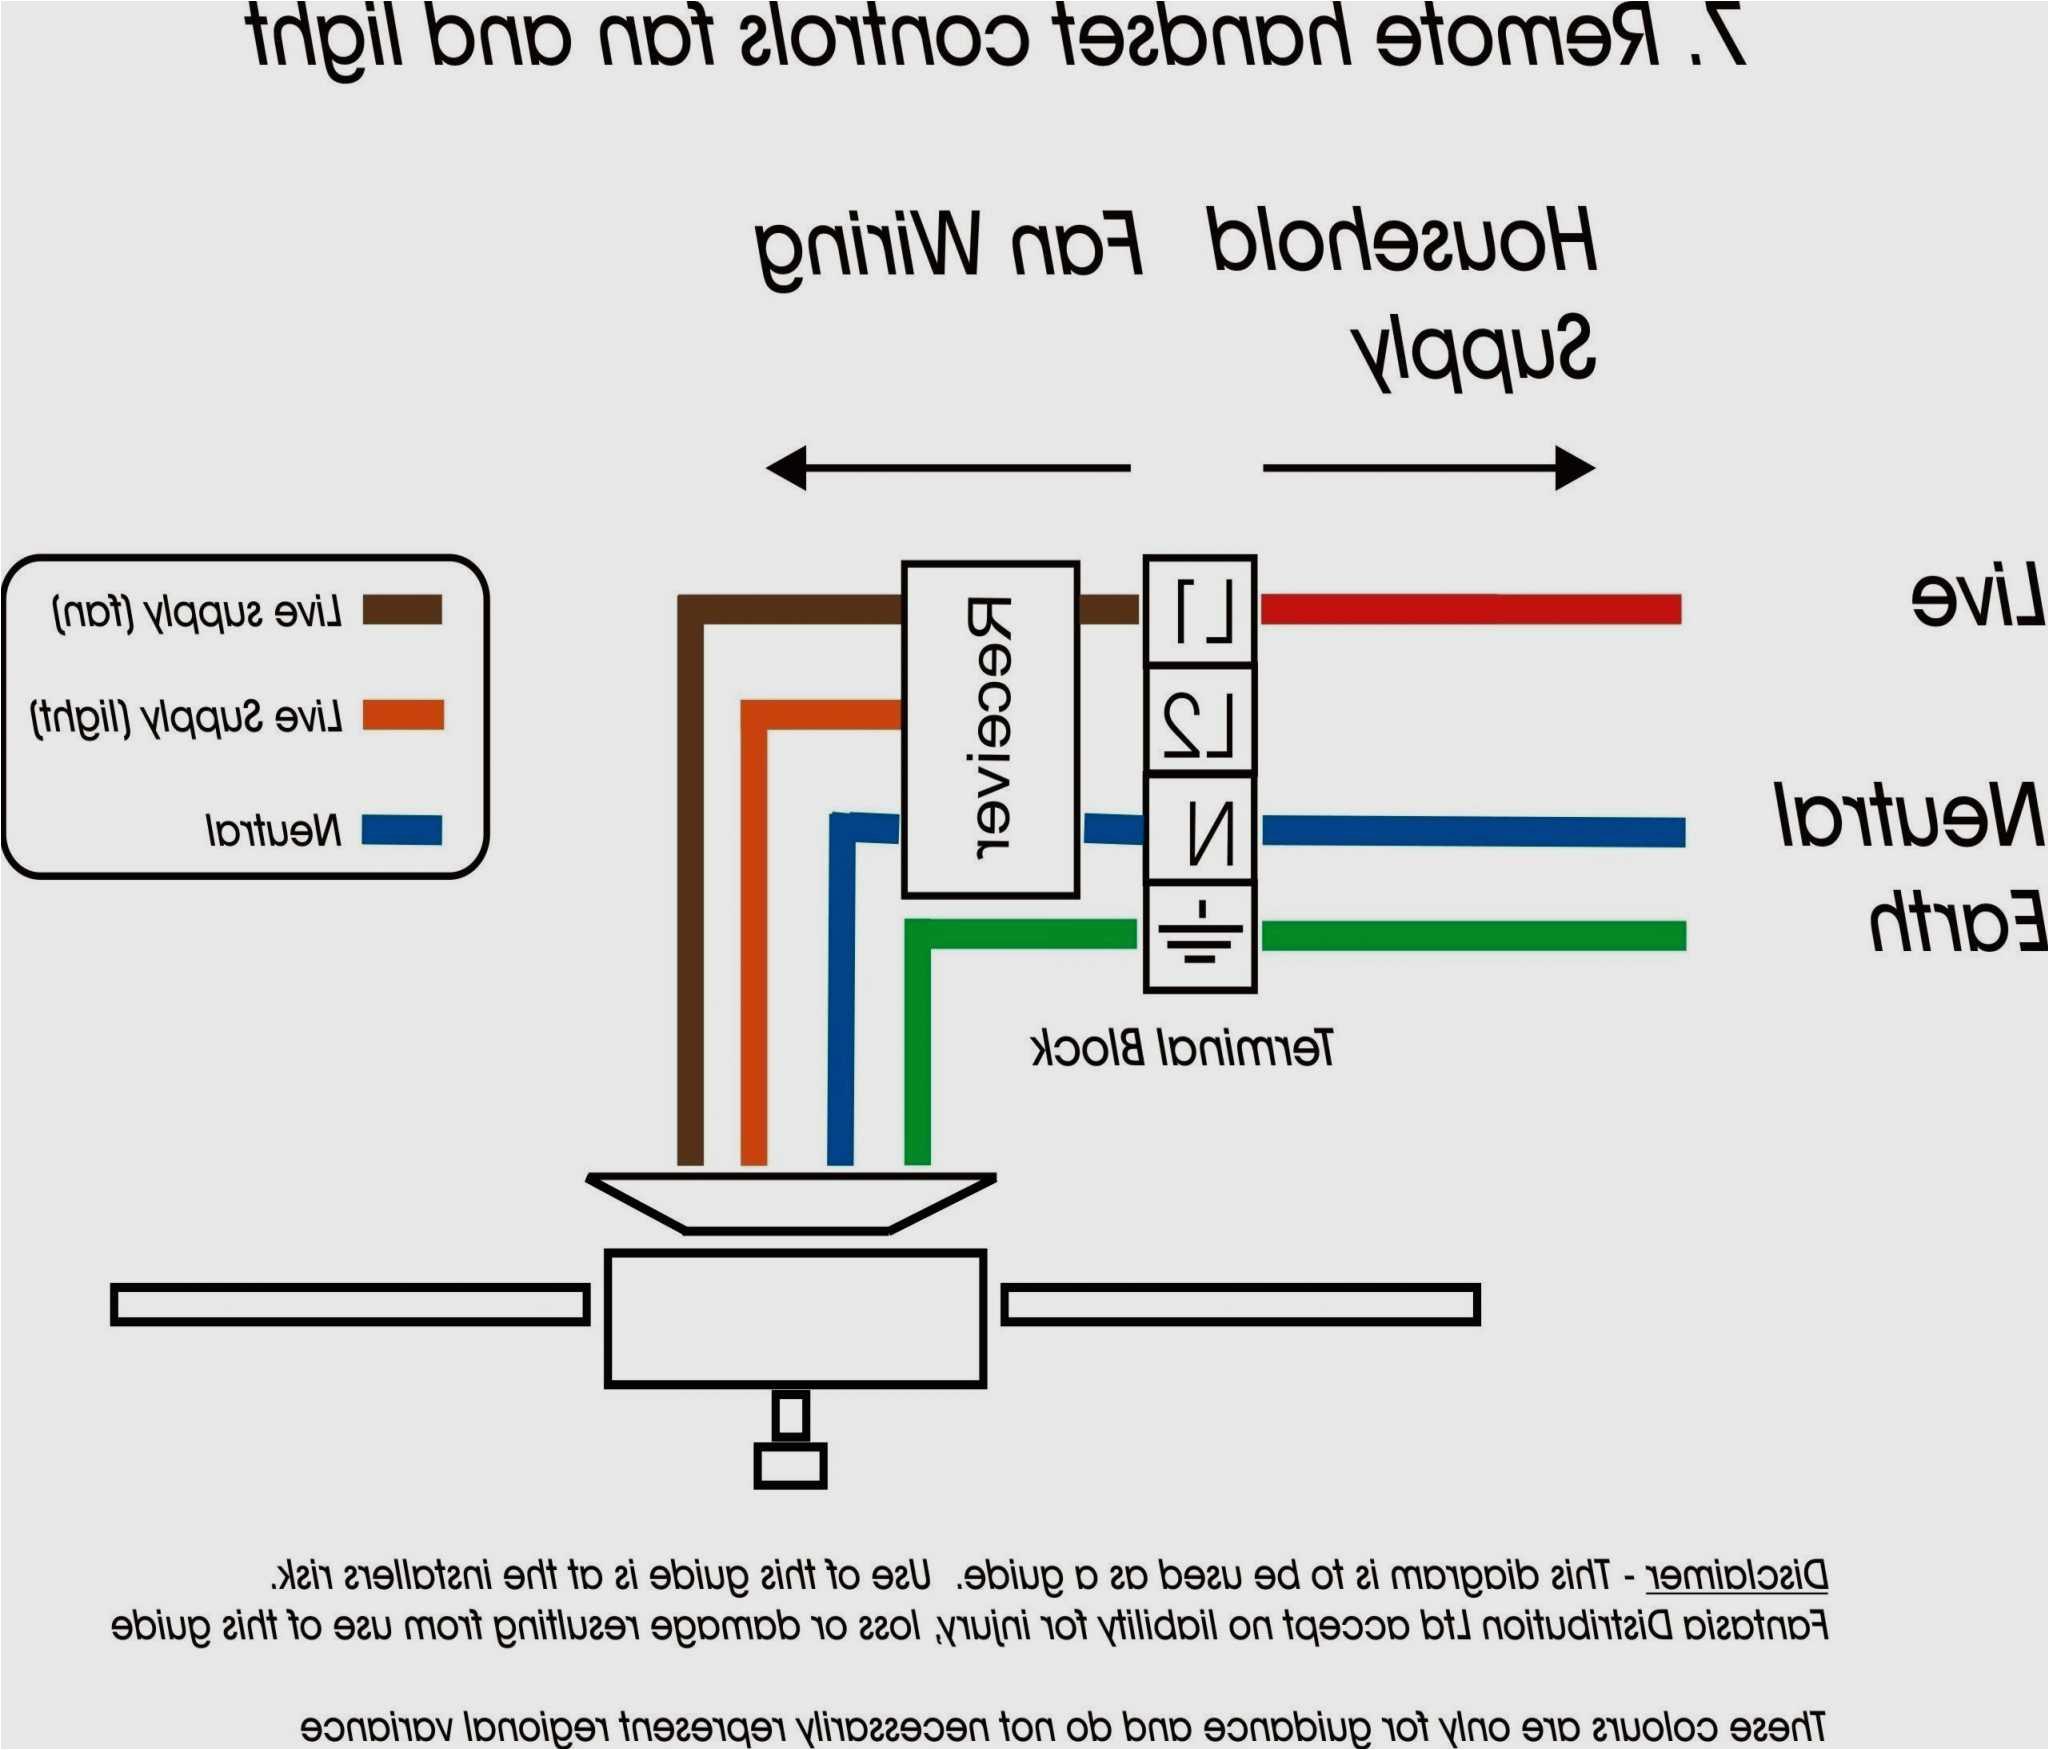 honeywell aquastat wiring diagram wiring diagrams